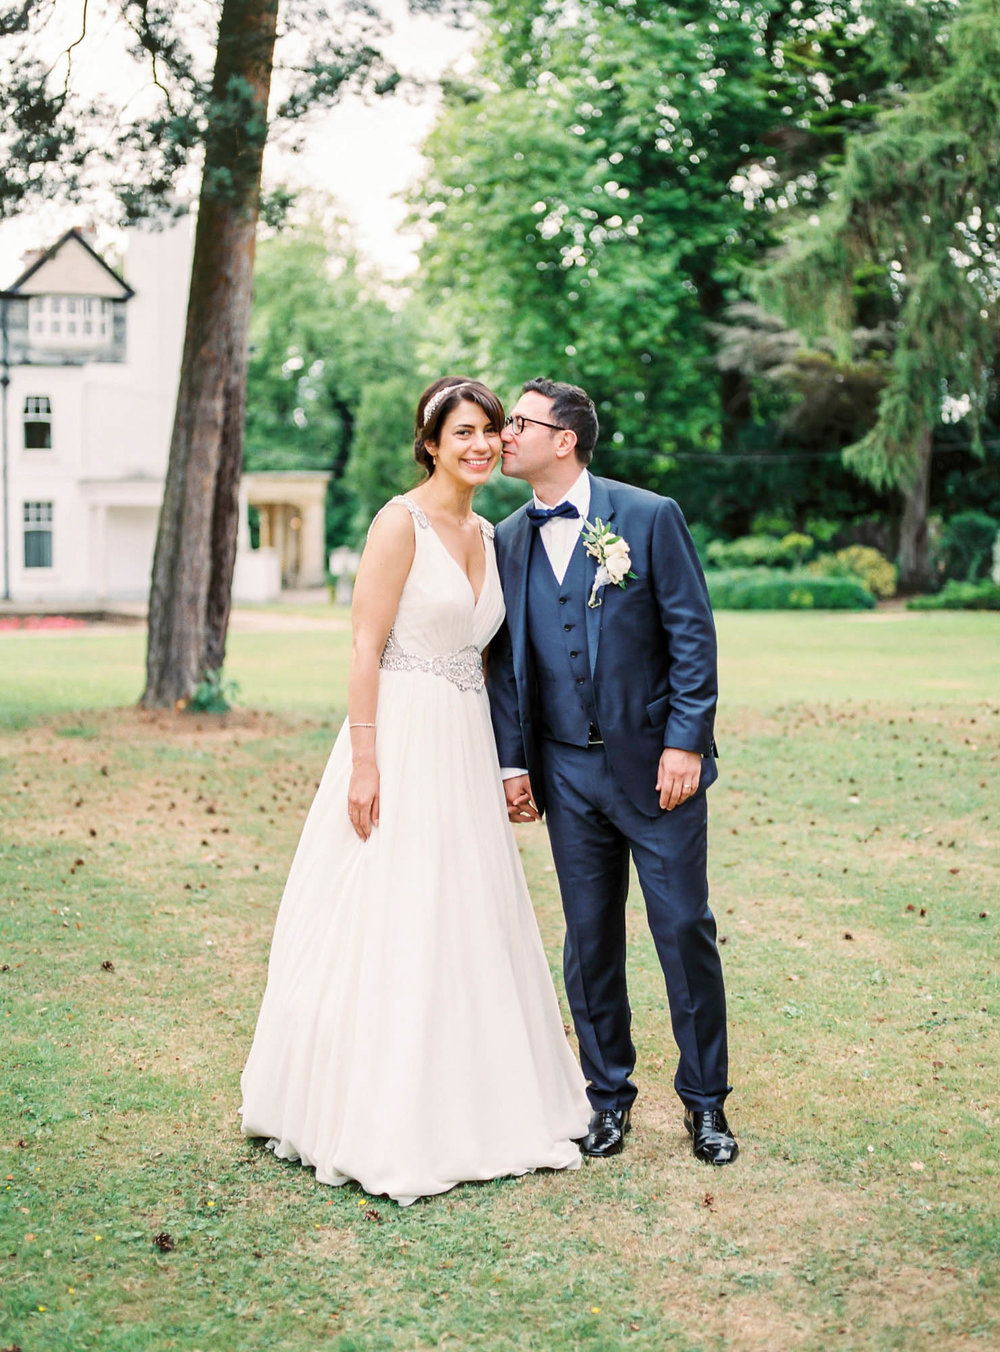 Amy O'Boyle Photography- Destination & UK Fine Art Film Wedding Photographer- Brickendonbury Estate Wedding-22.jpg